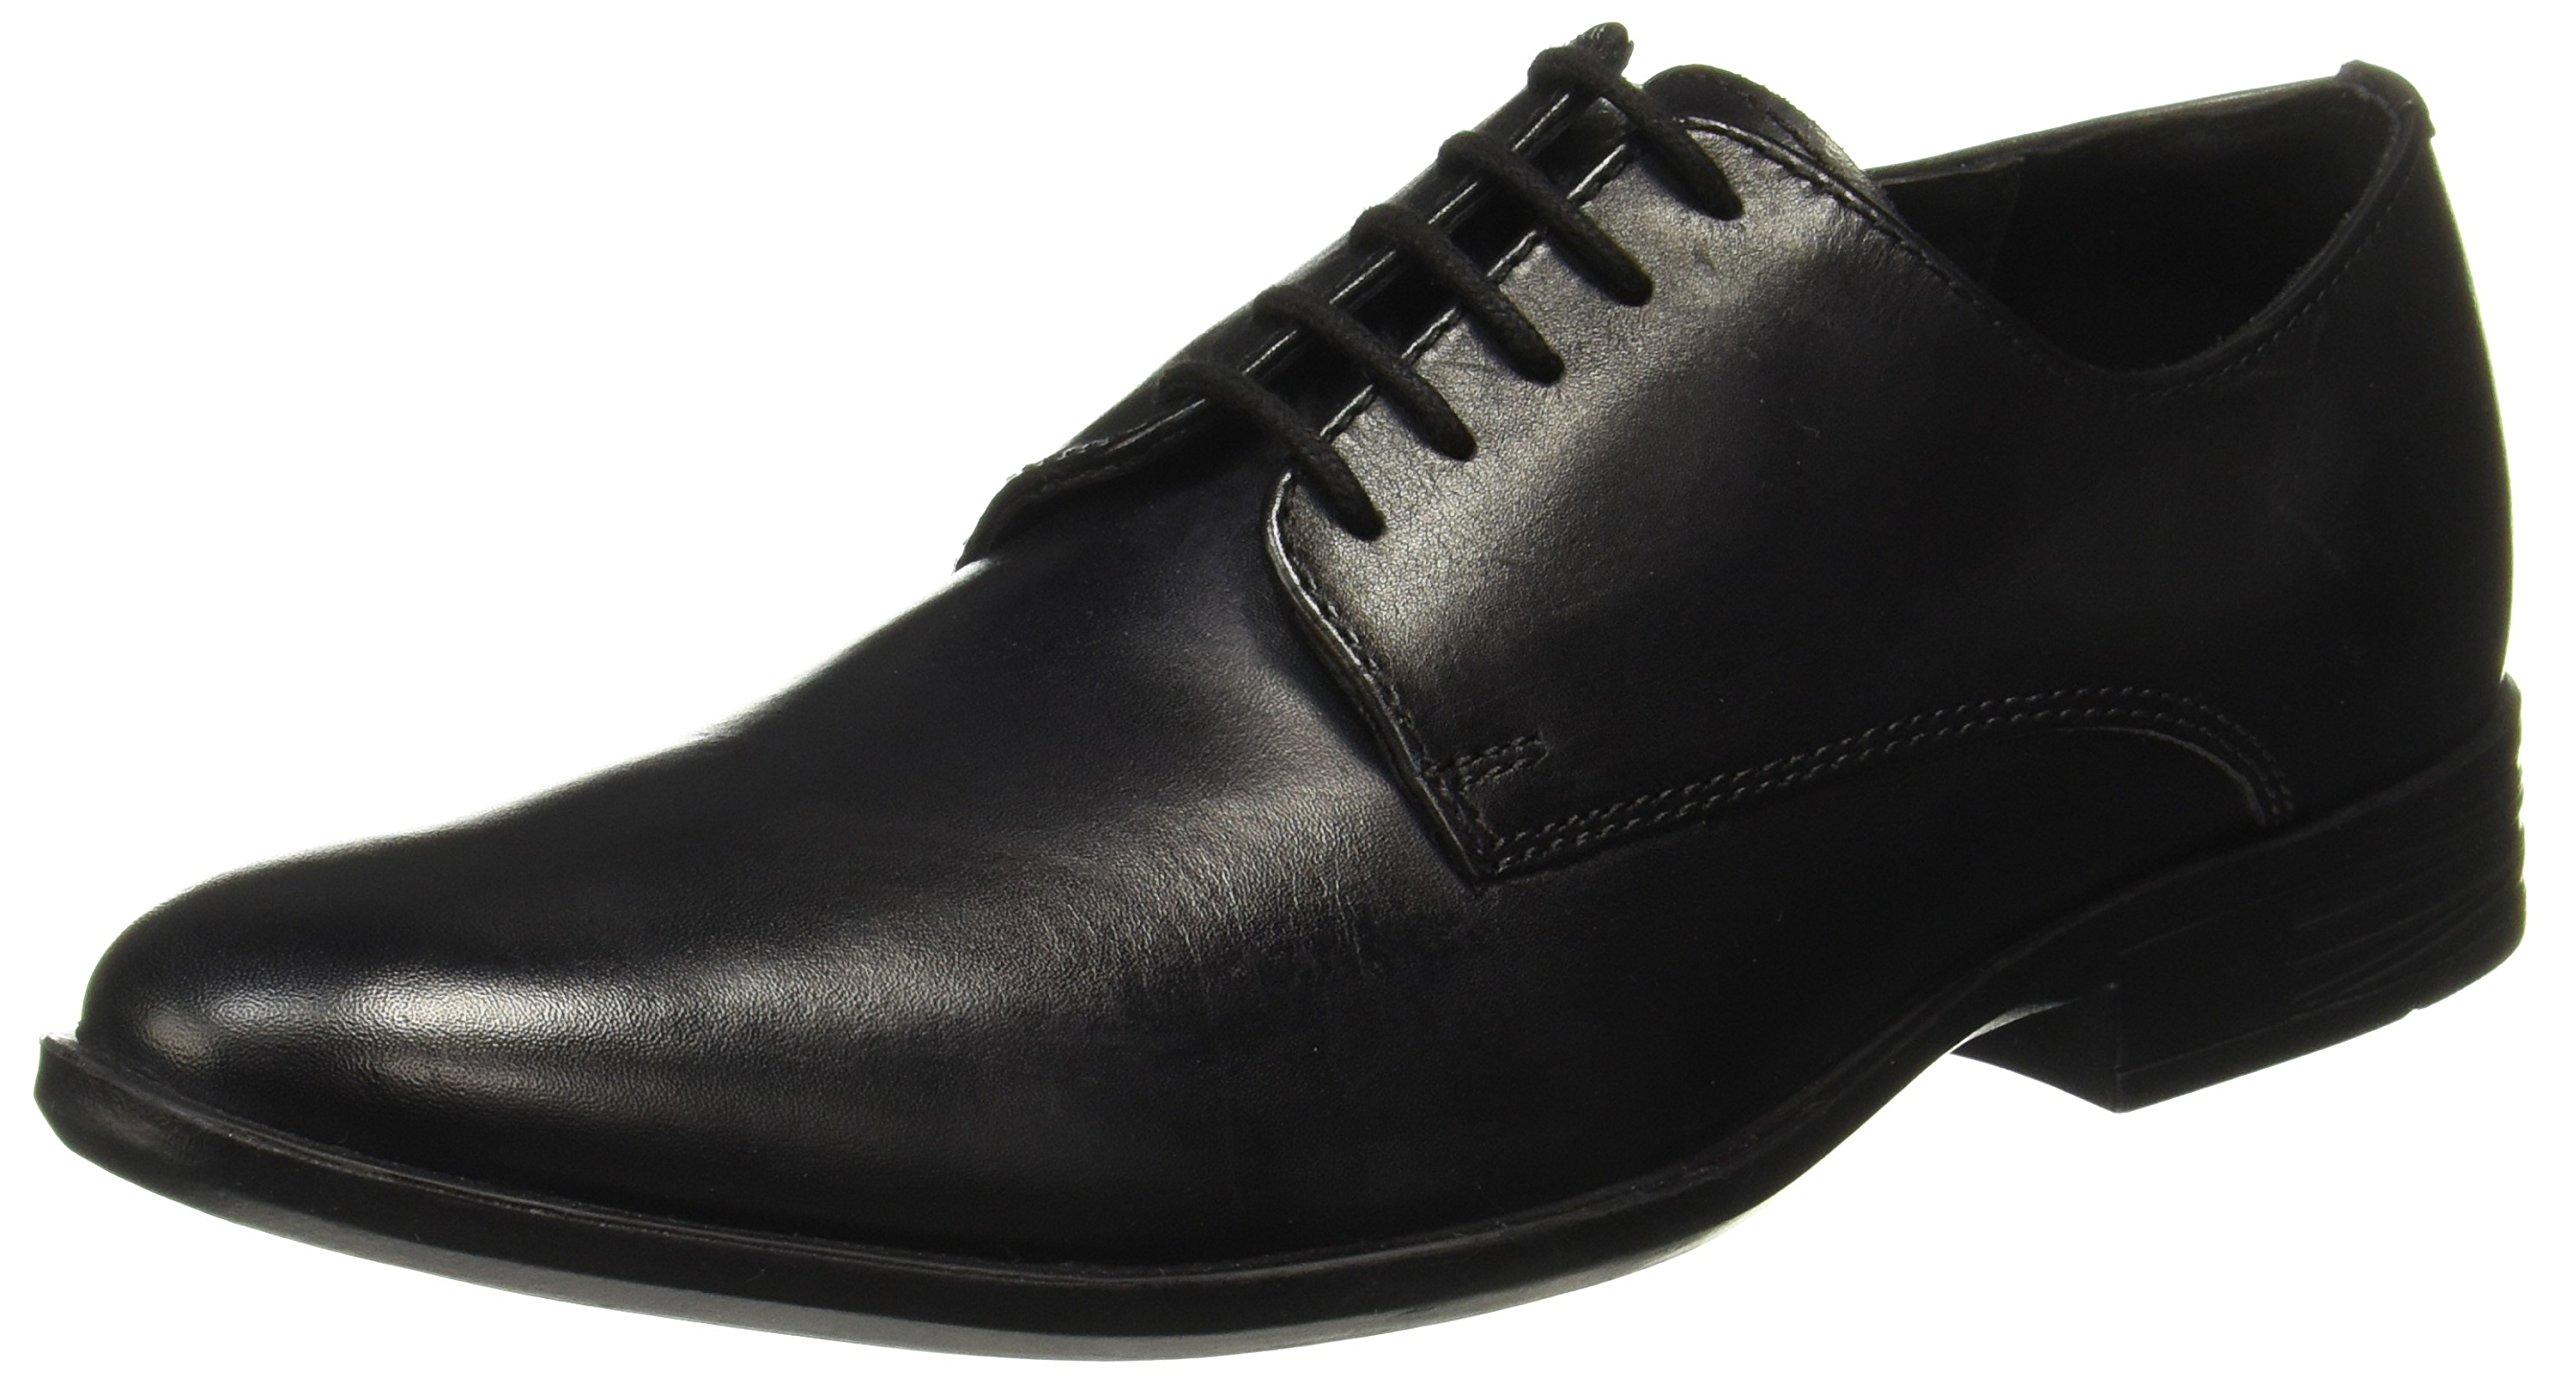 Hush Puppies Men's Pl58 Formal Shoes